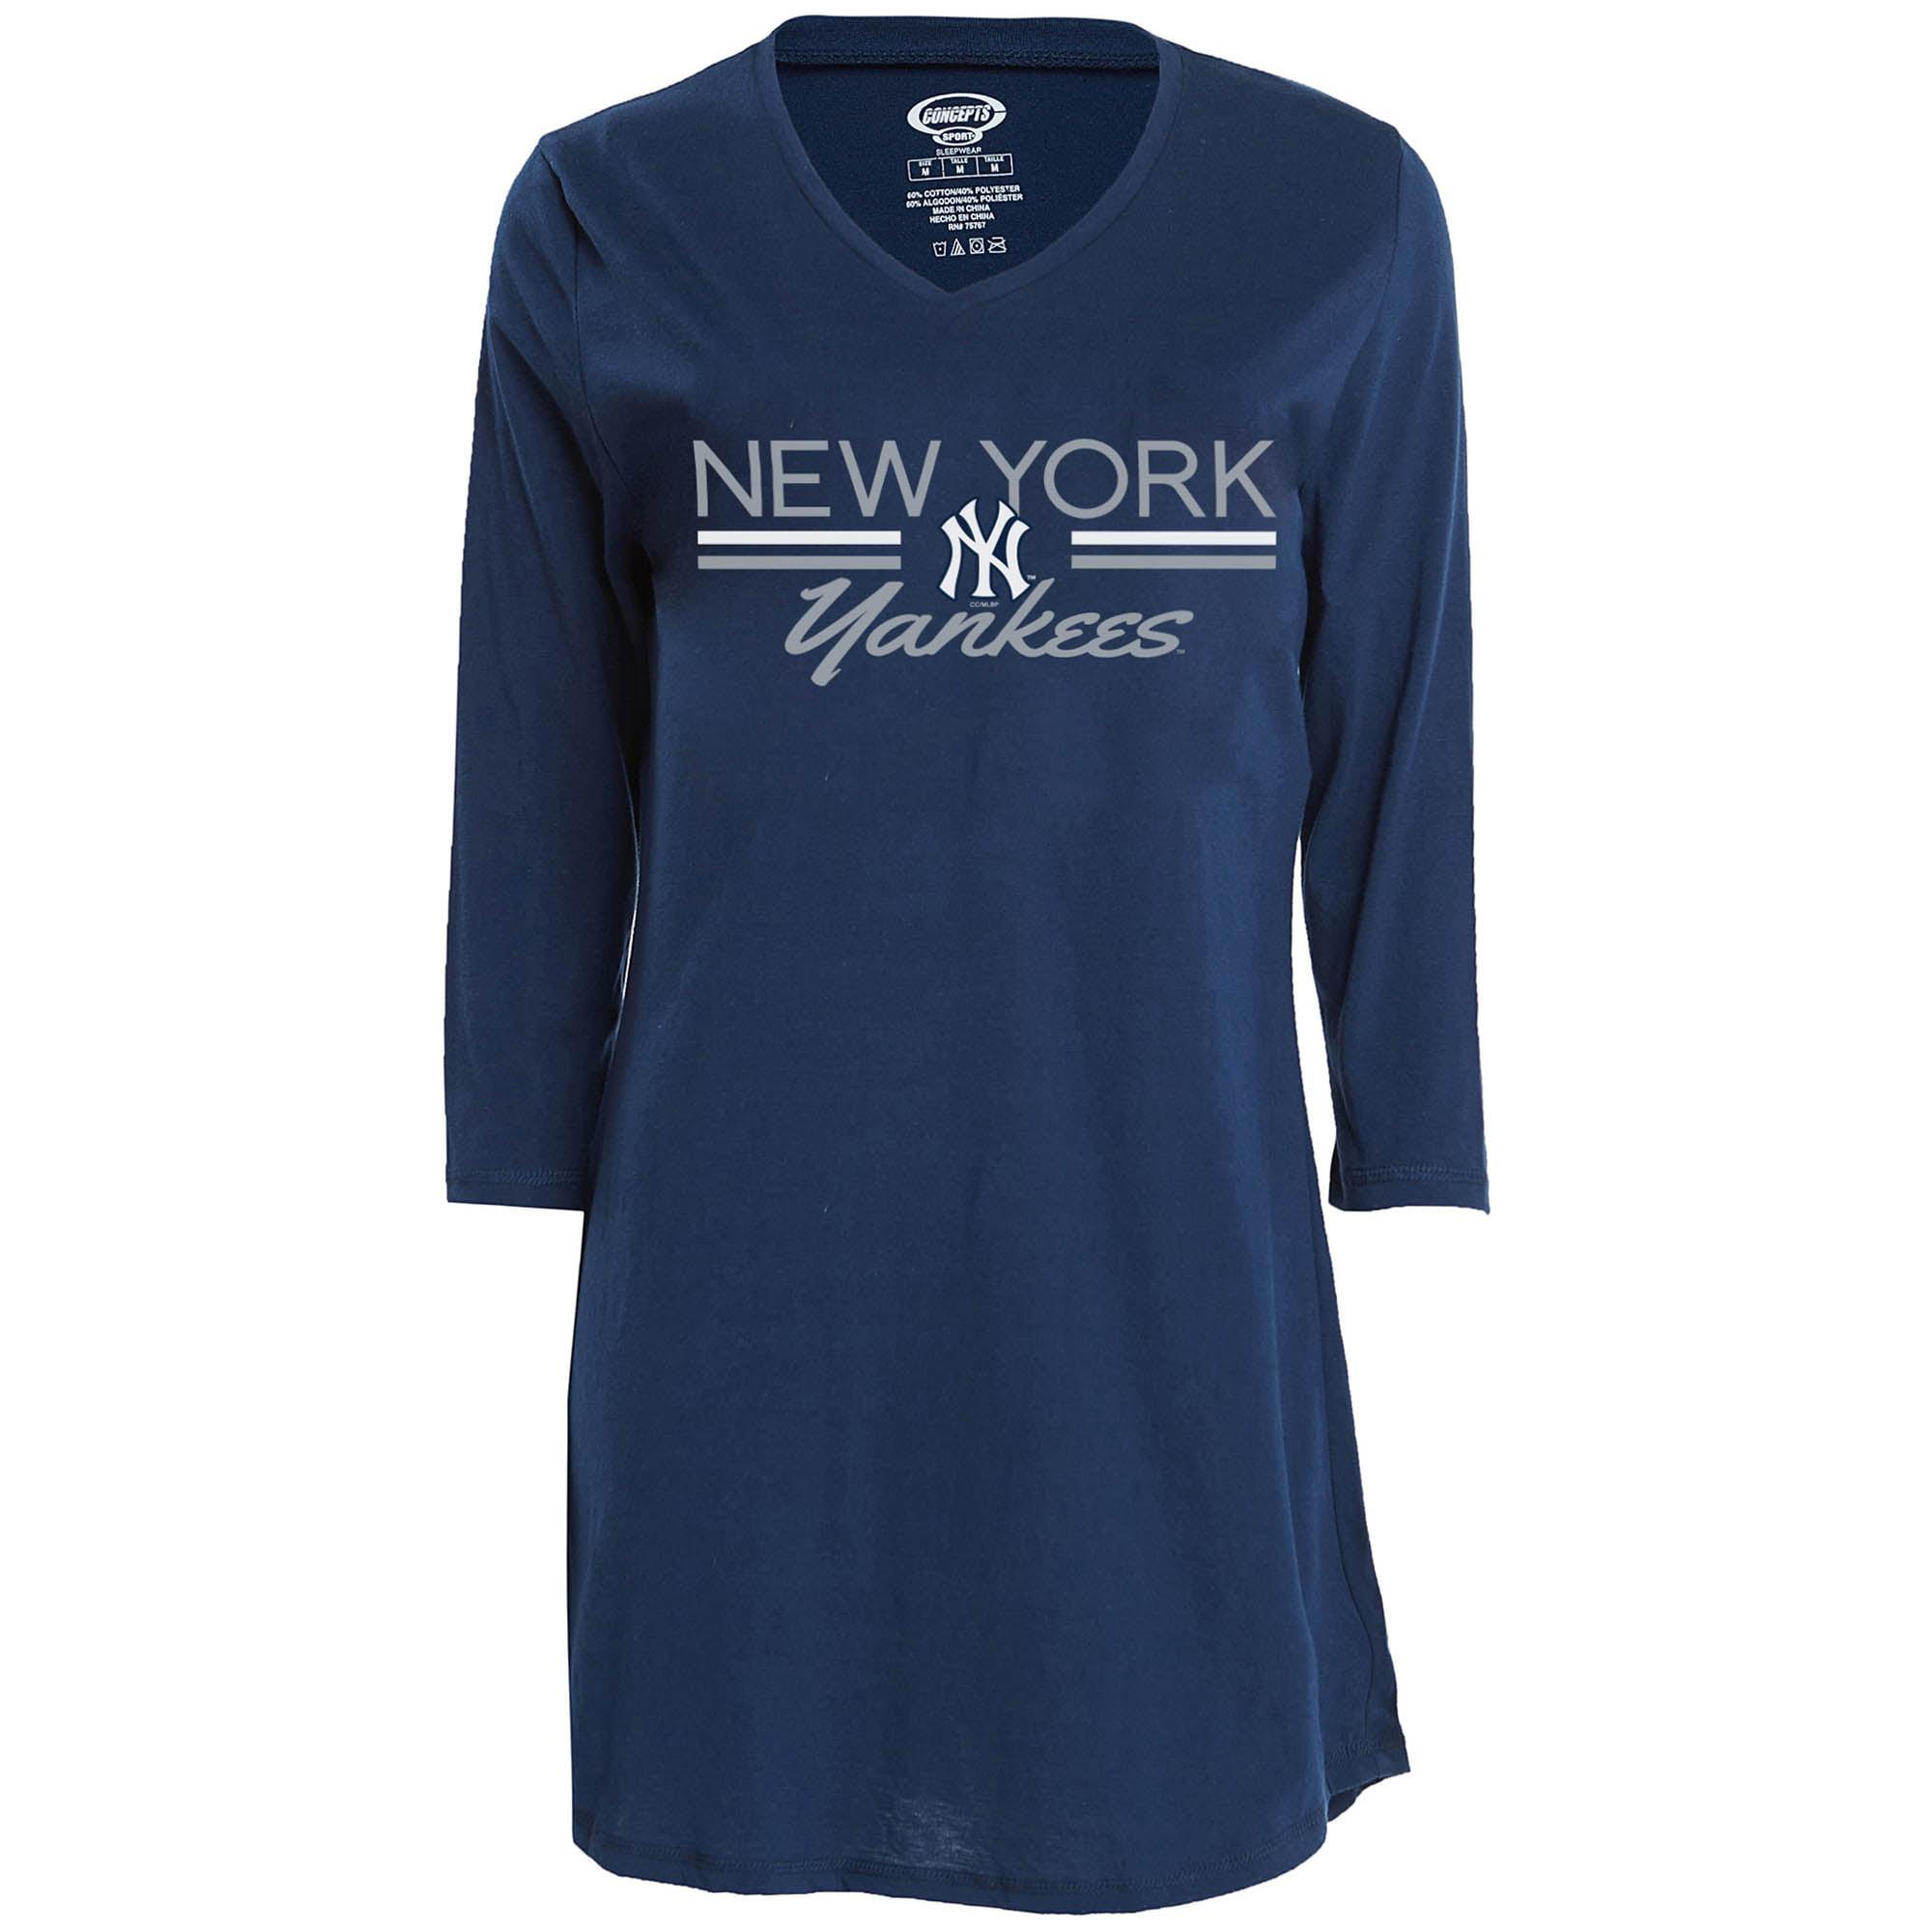 New York Yankees Concepts Sport Women's Duo V-Neck Nightshirt - Navy